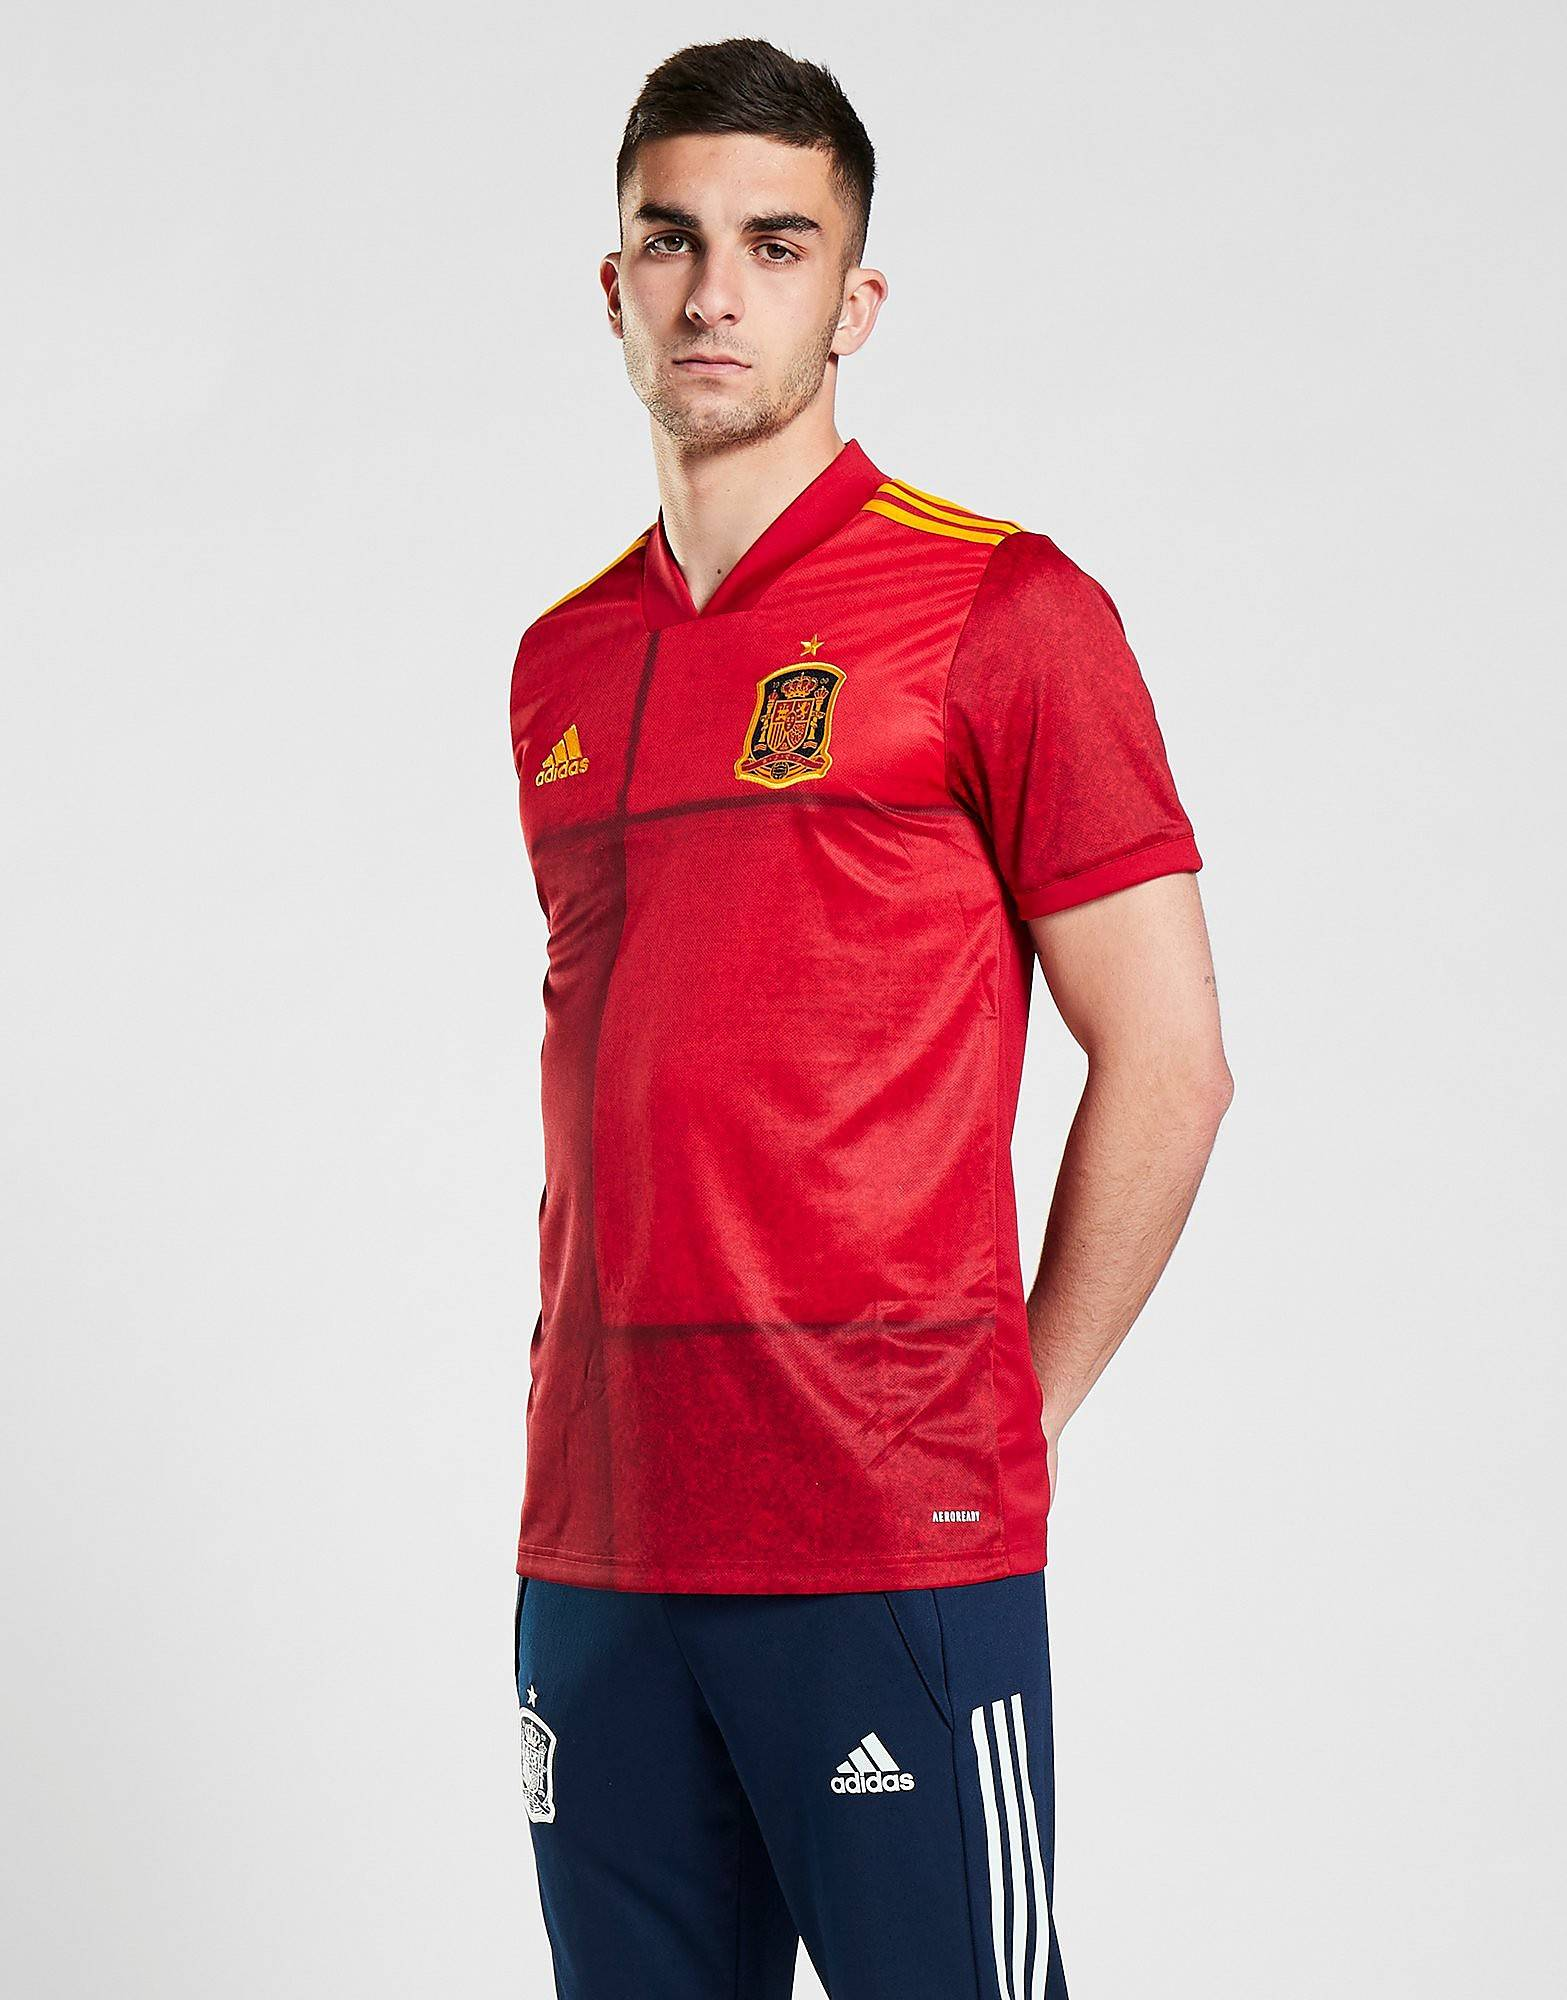 Image of Adidas Spain 2020 Kotipaita Miehet - Mens, Punainen